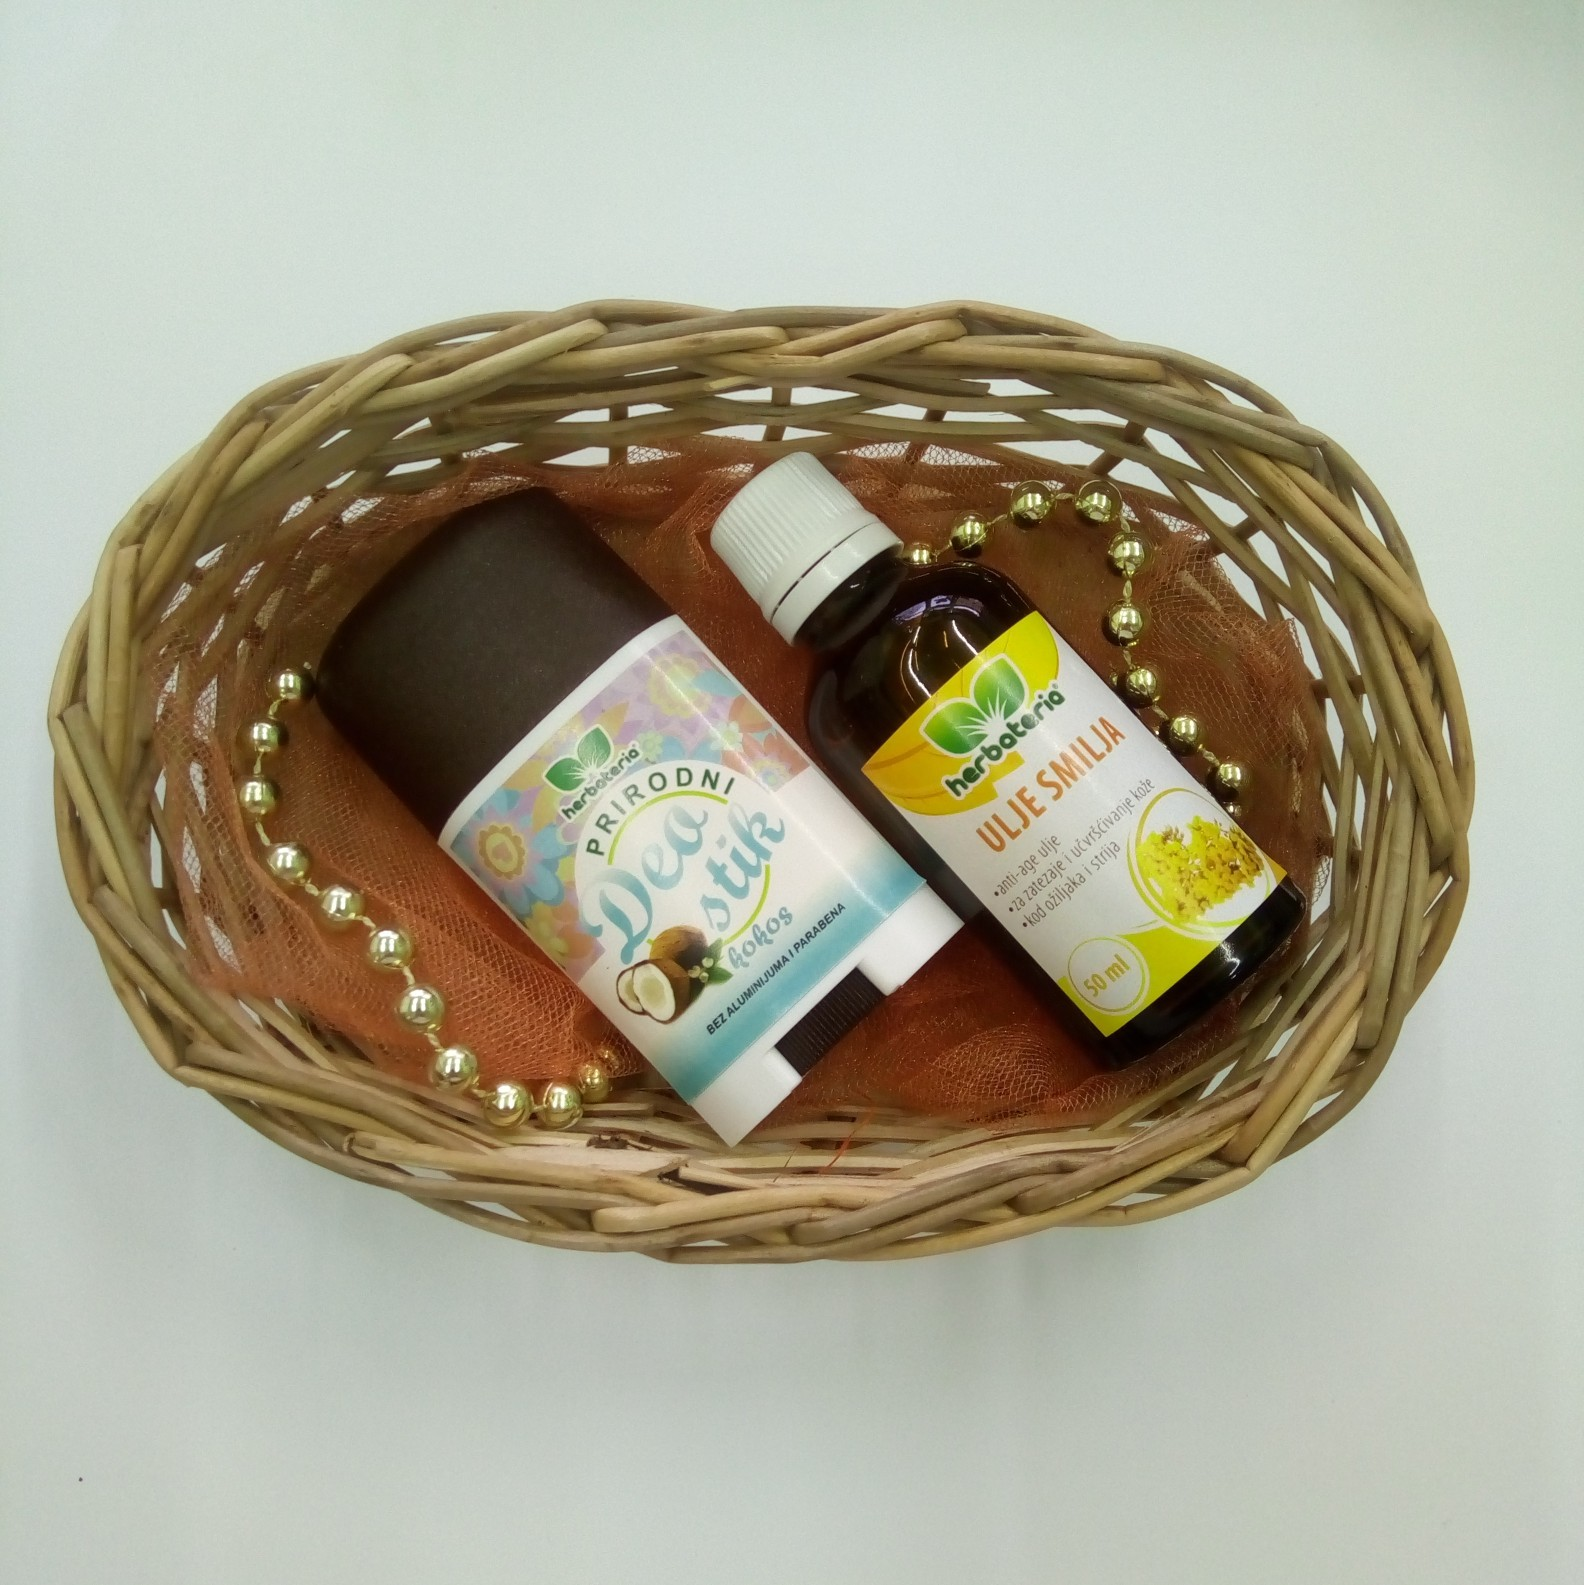 Poklon set (deo stik, ulje smilja 50 ml) 00471